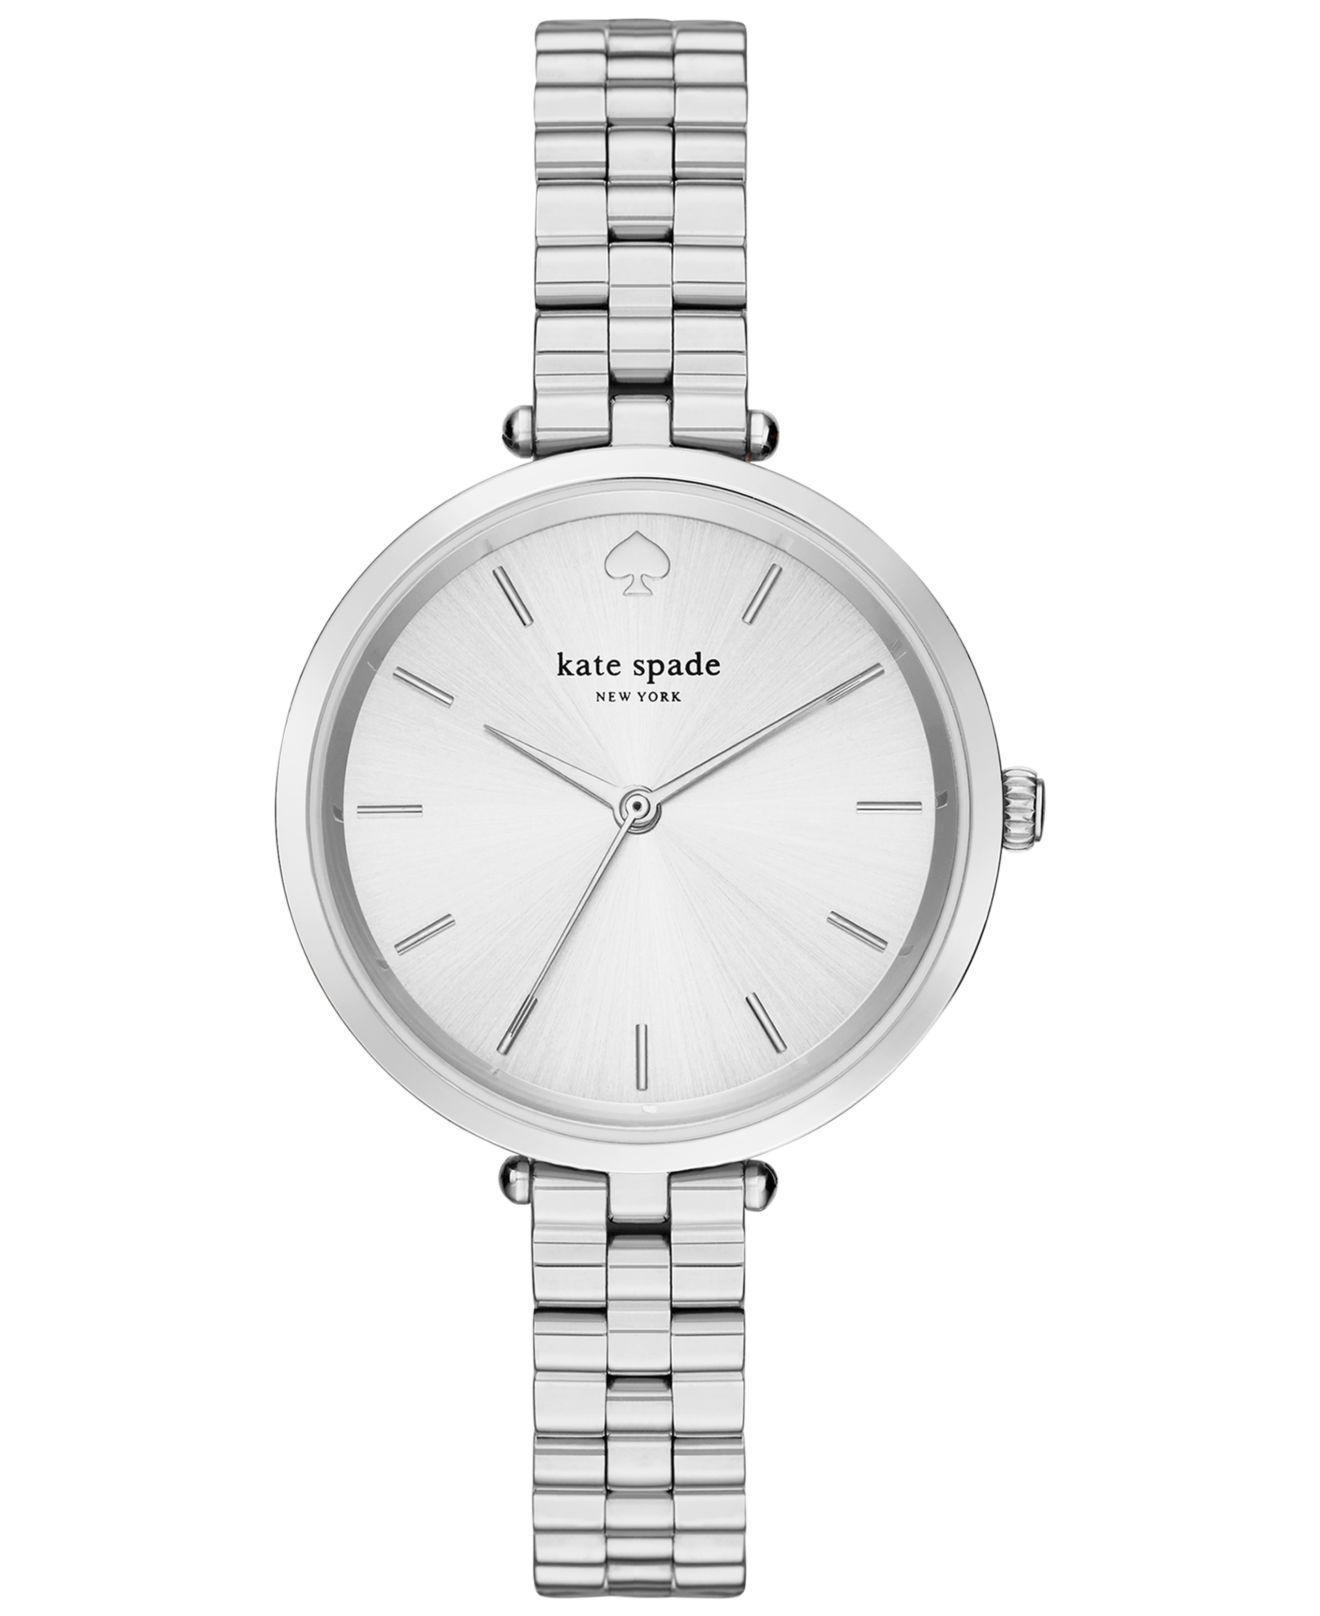 42a340466b2 Kate Spade - Gray Women s Holland Stainless Steel Bracelet Watch 34mm  1yru0859 - Lyst. View fullscreen